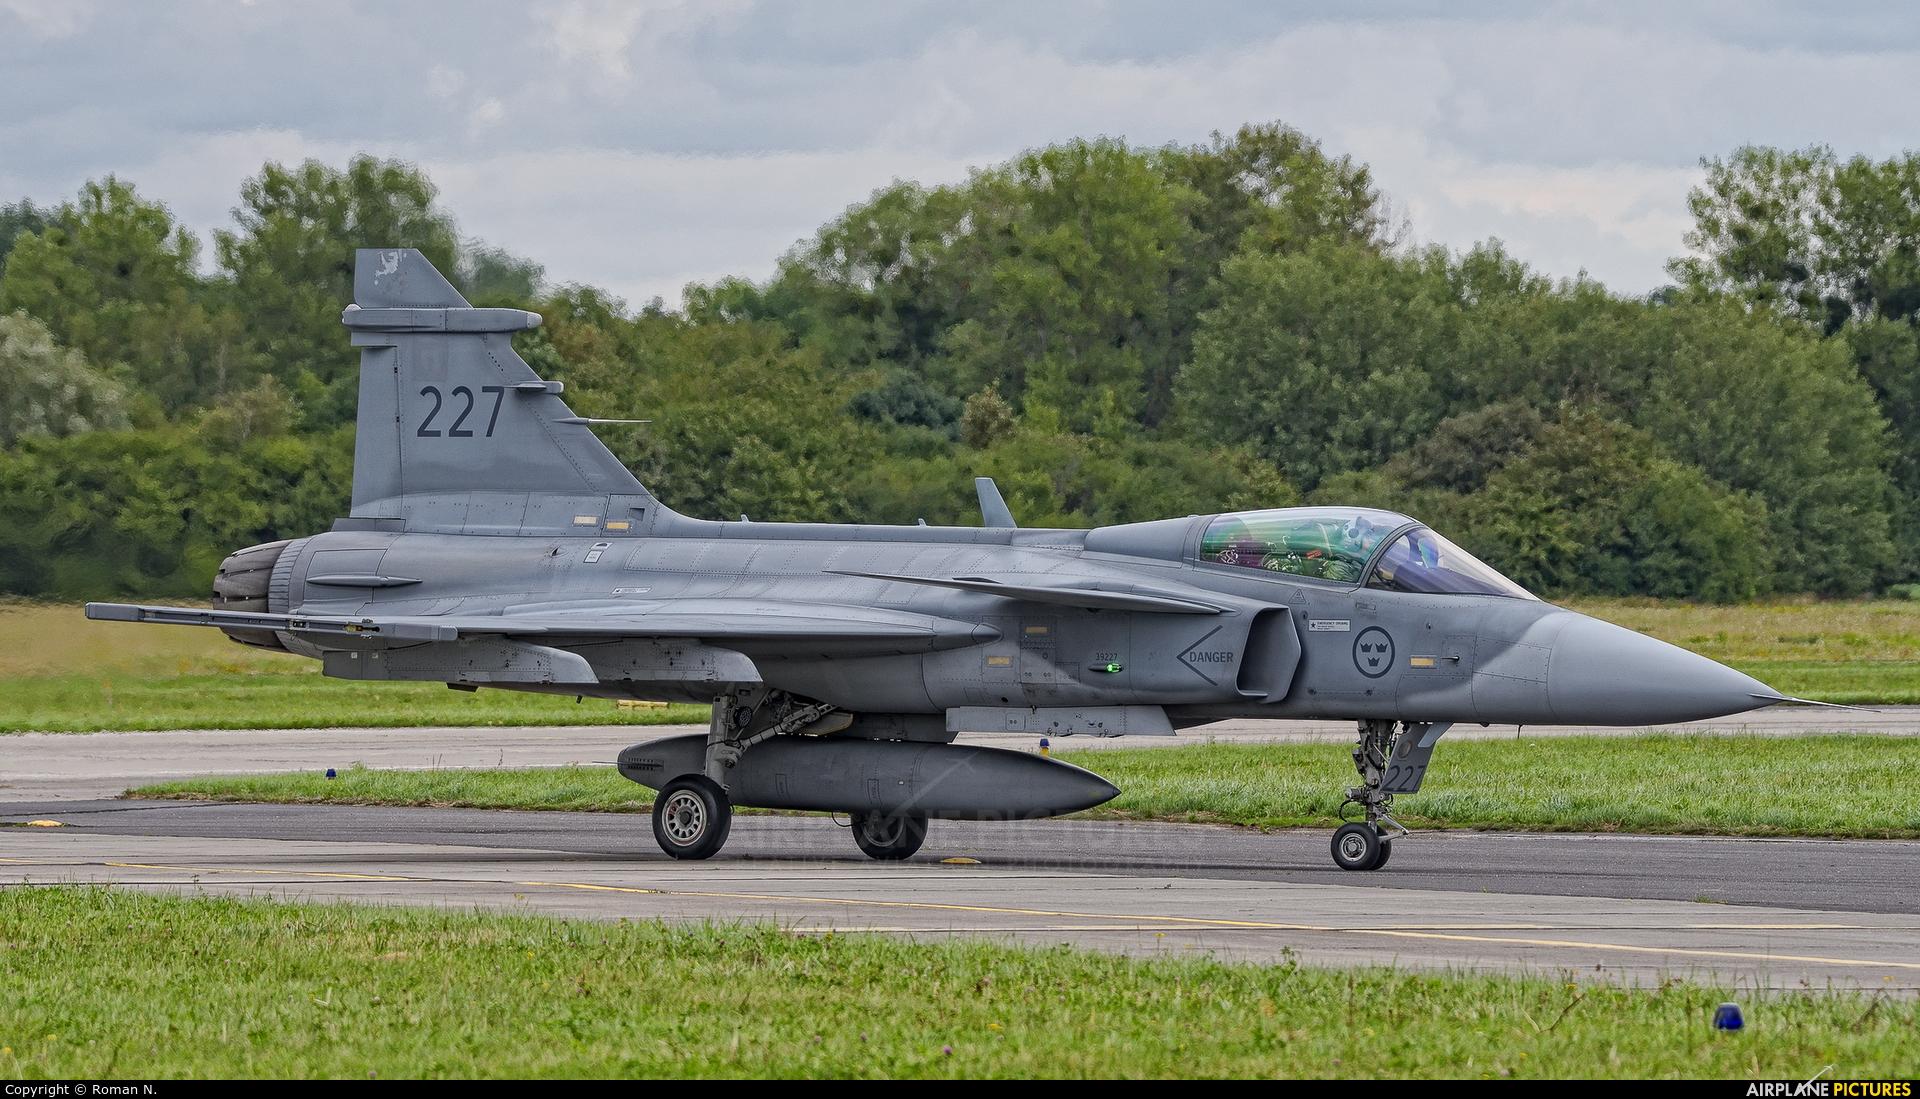 Sweden - Air Force 39227 aircraft at Gdynia- Babie Doły (Oksywie)